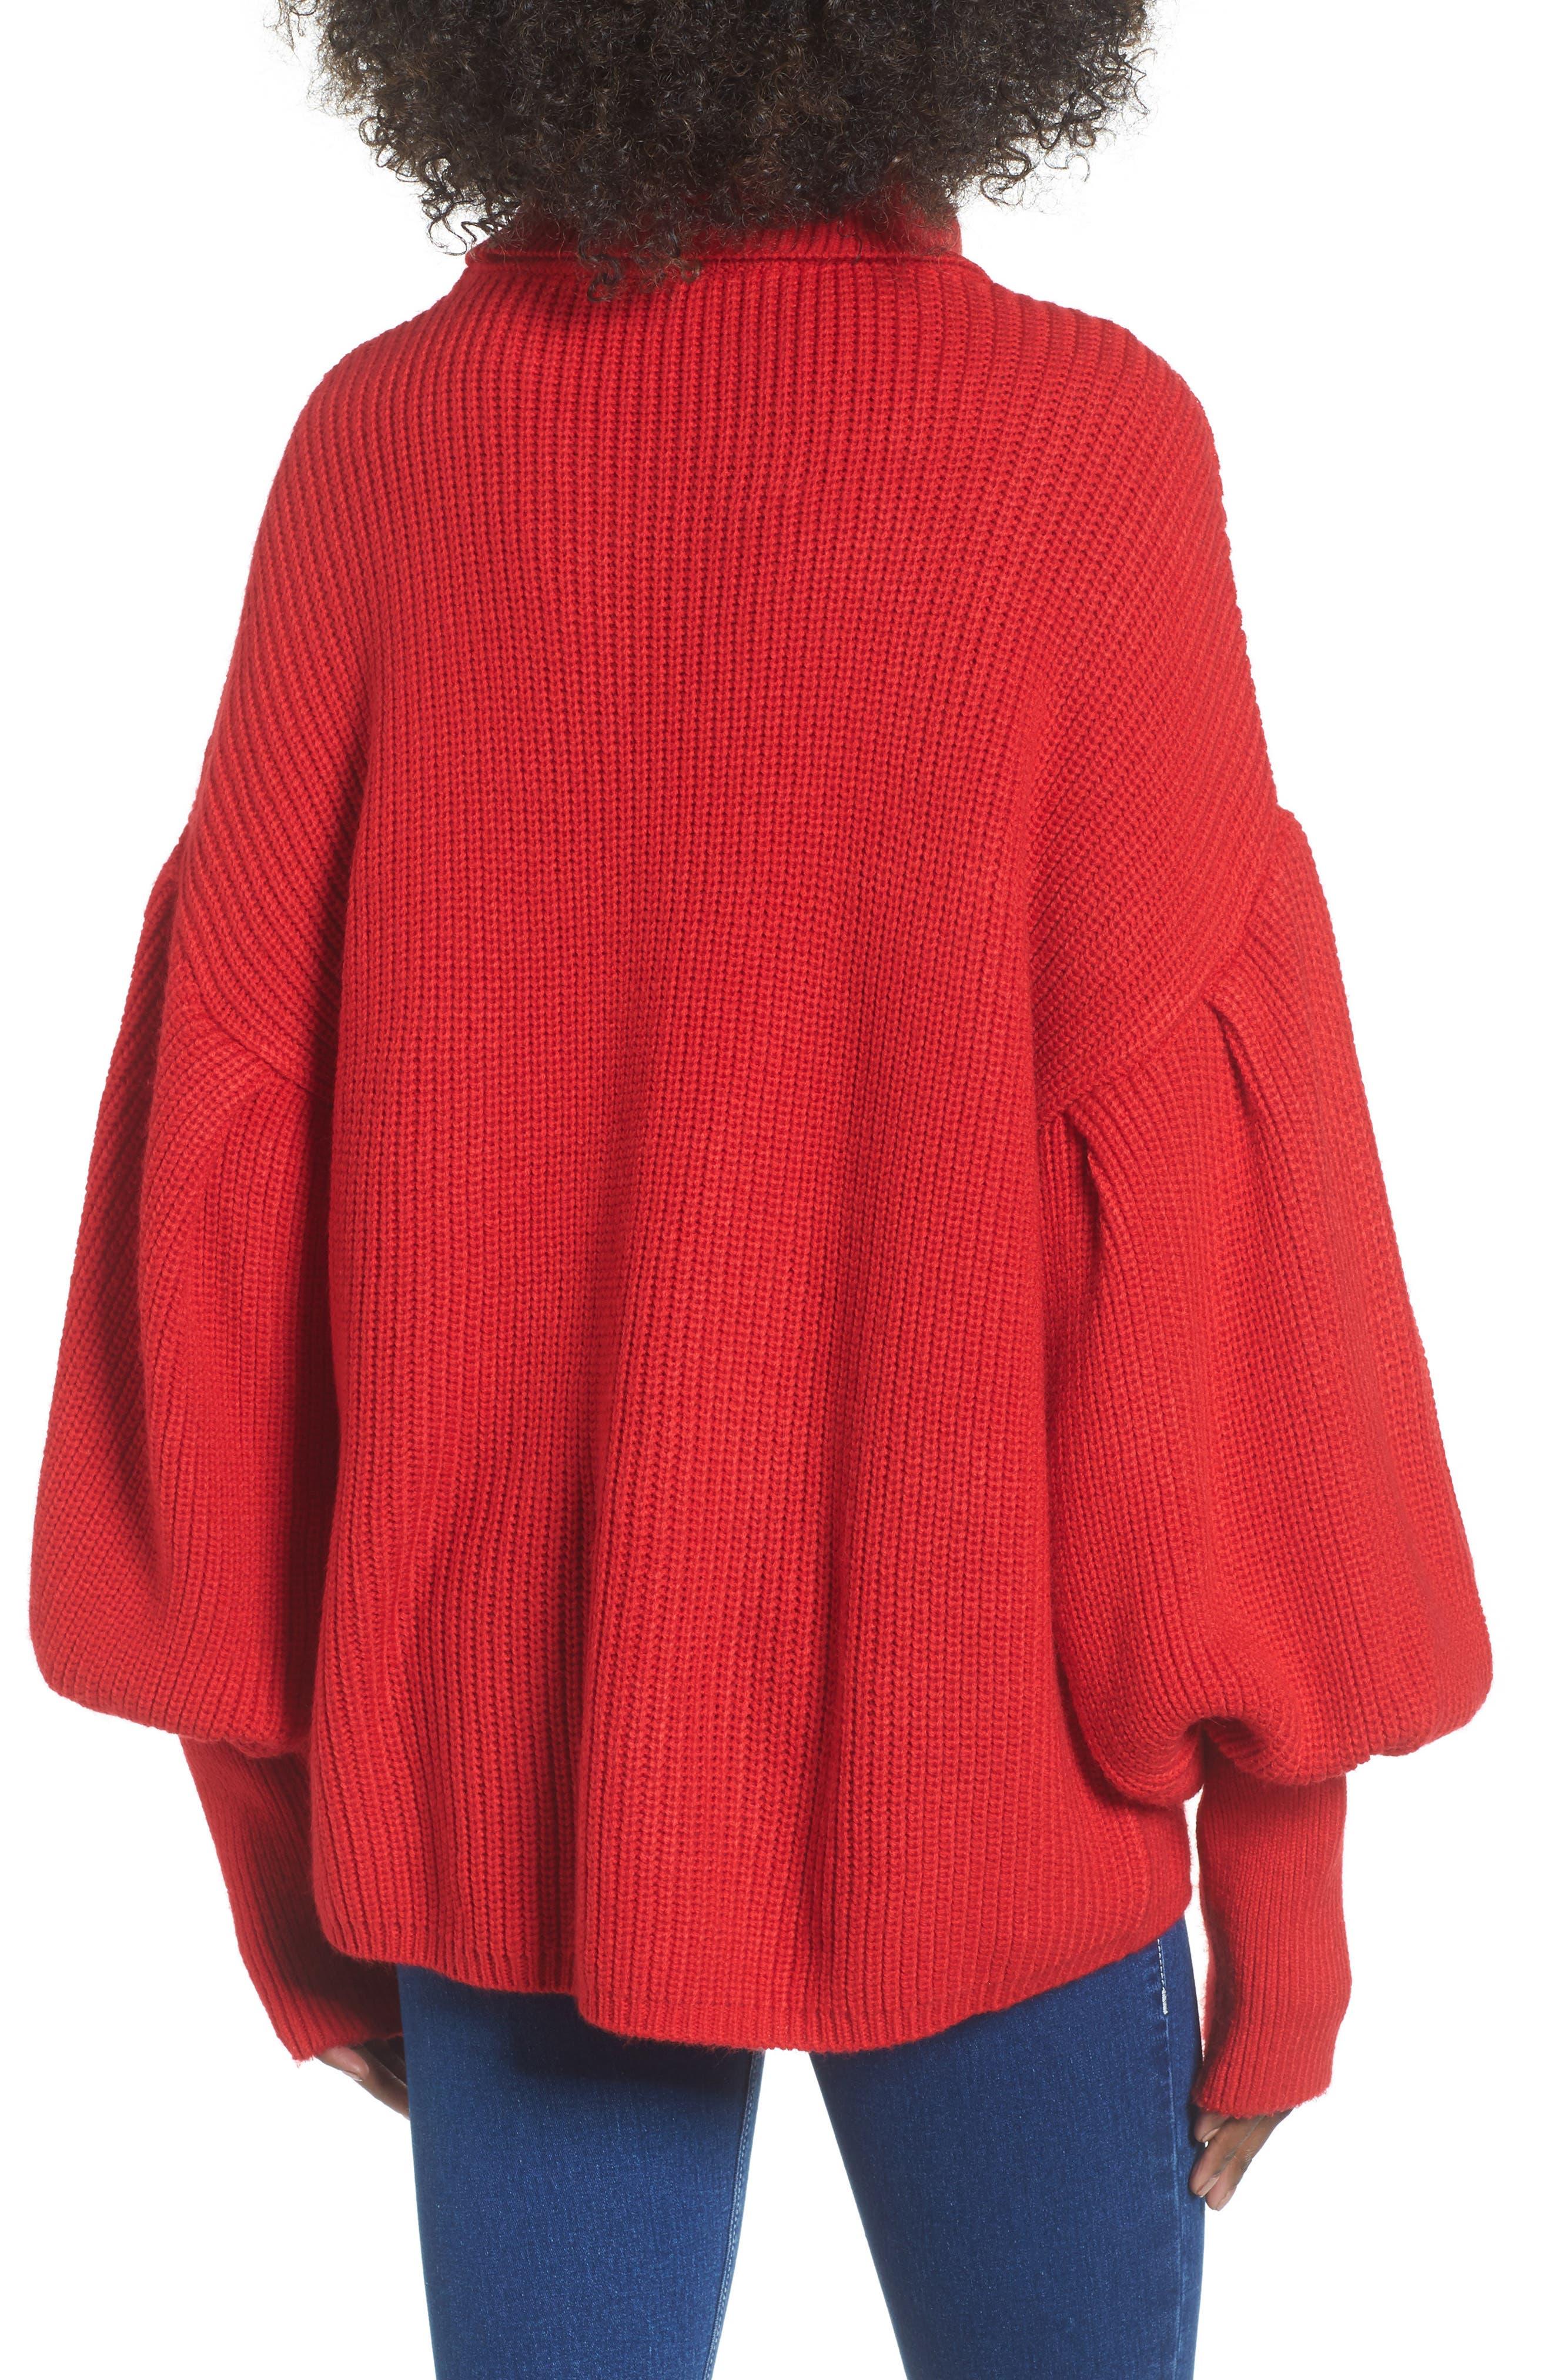 Balloon Sleeve Turtleneck Sweater,                             Alternate thumbnail 2, color,                             600